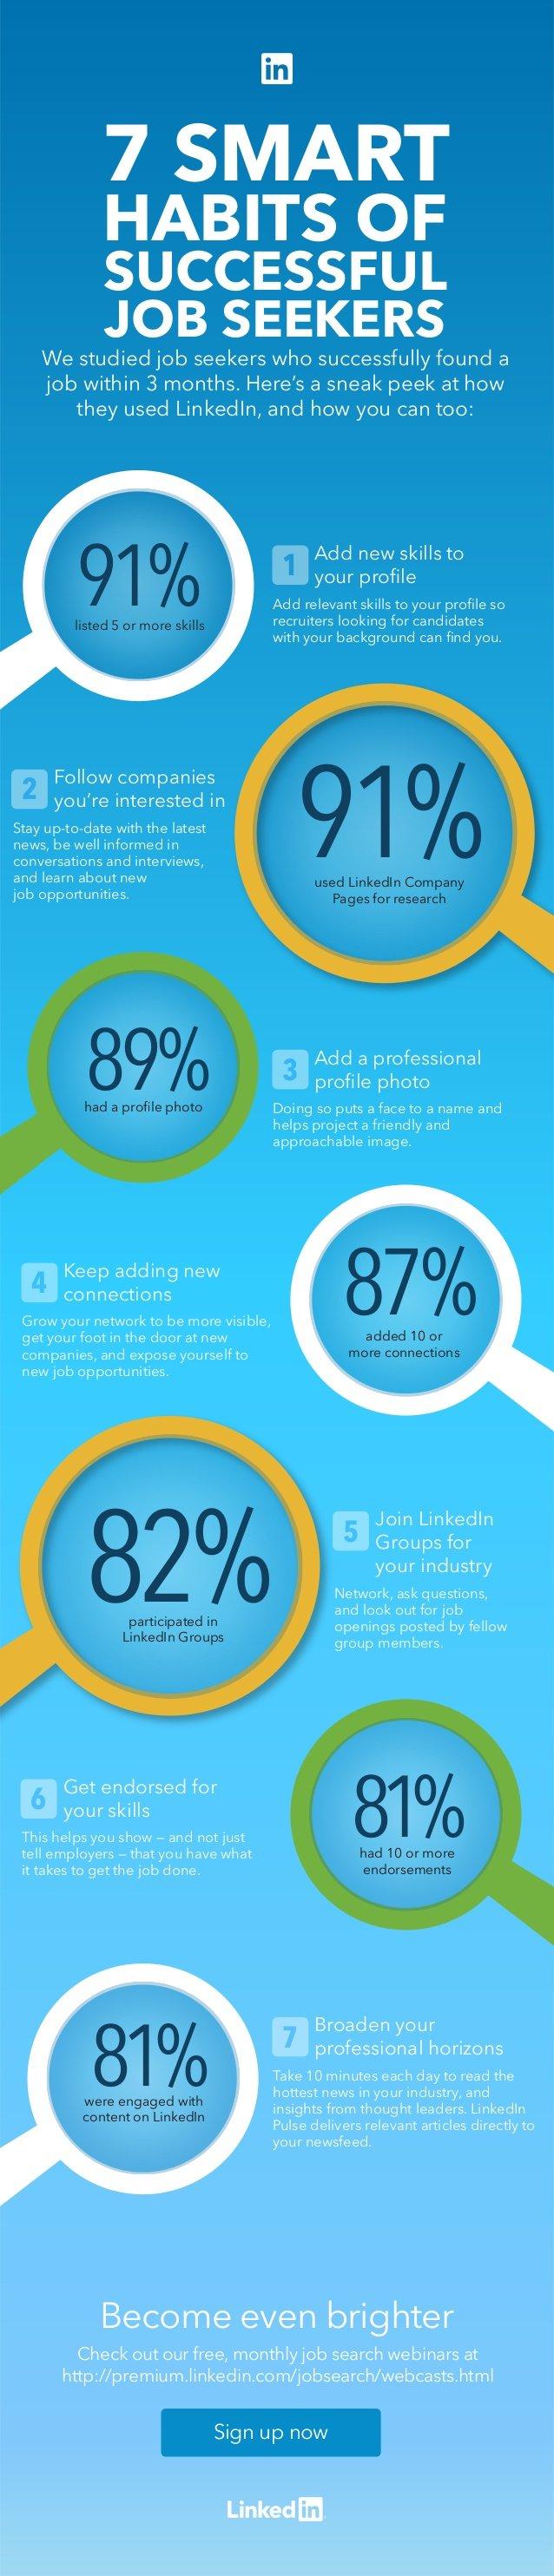 7 smart habits of successful job seekers